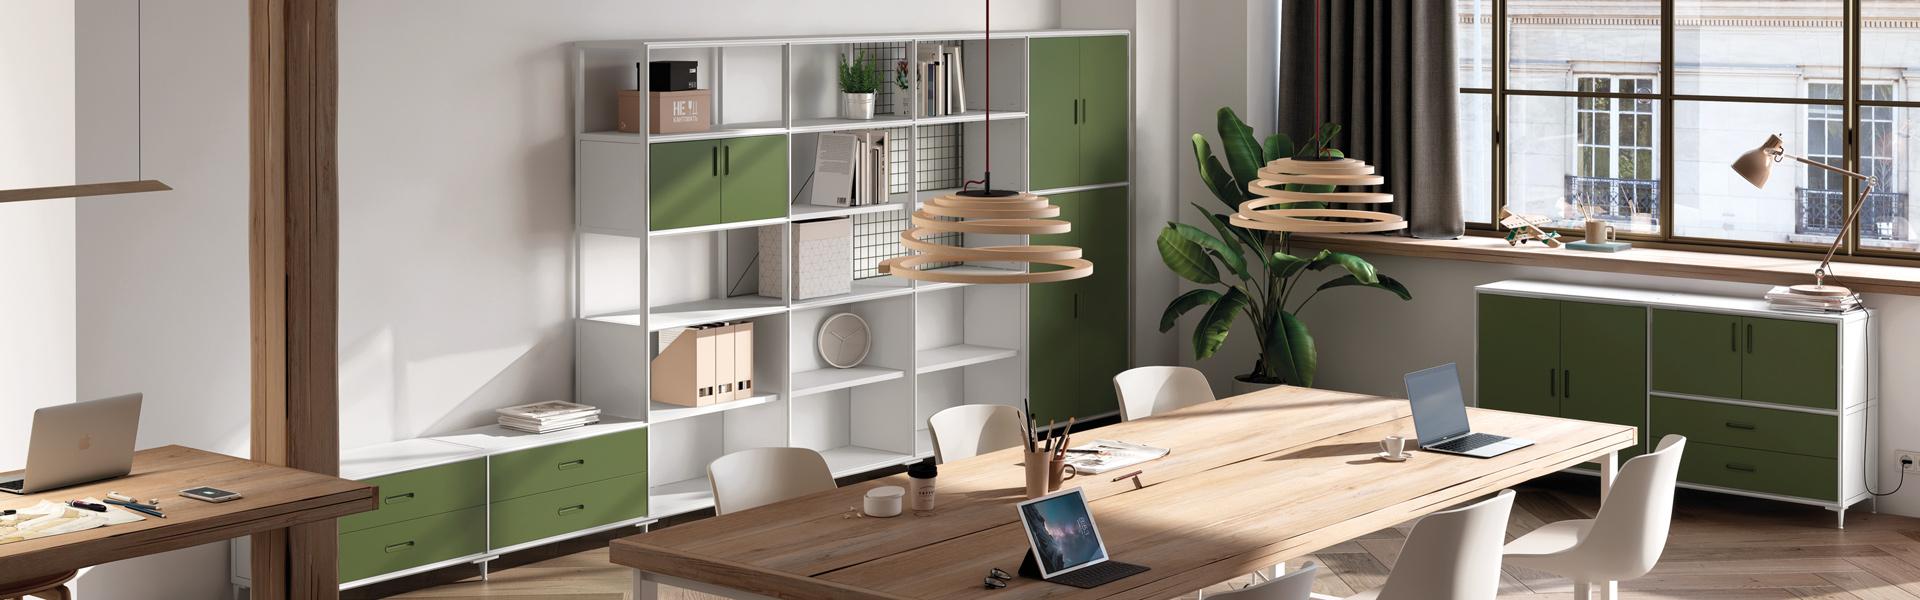 Nodum, modular cabinet system